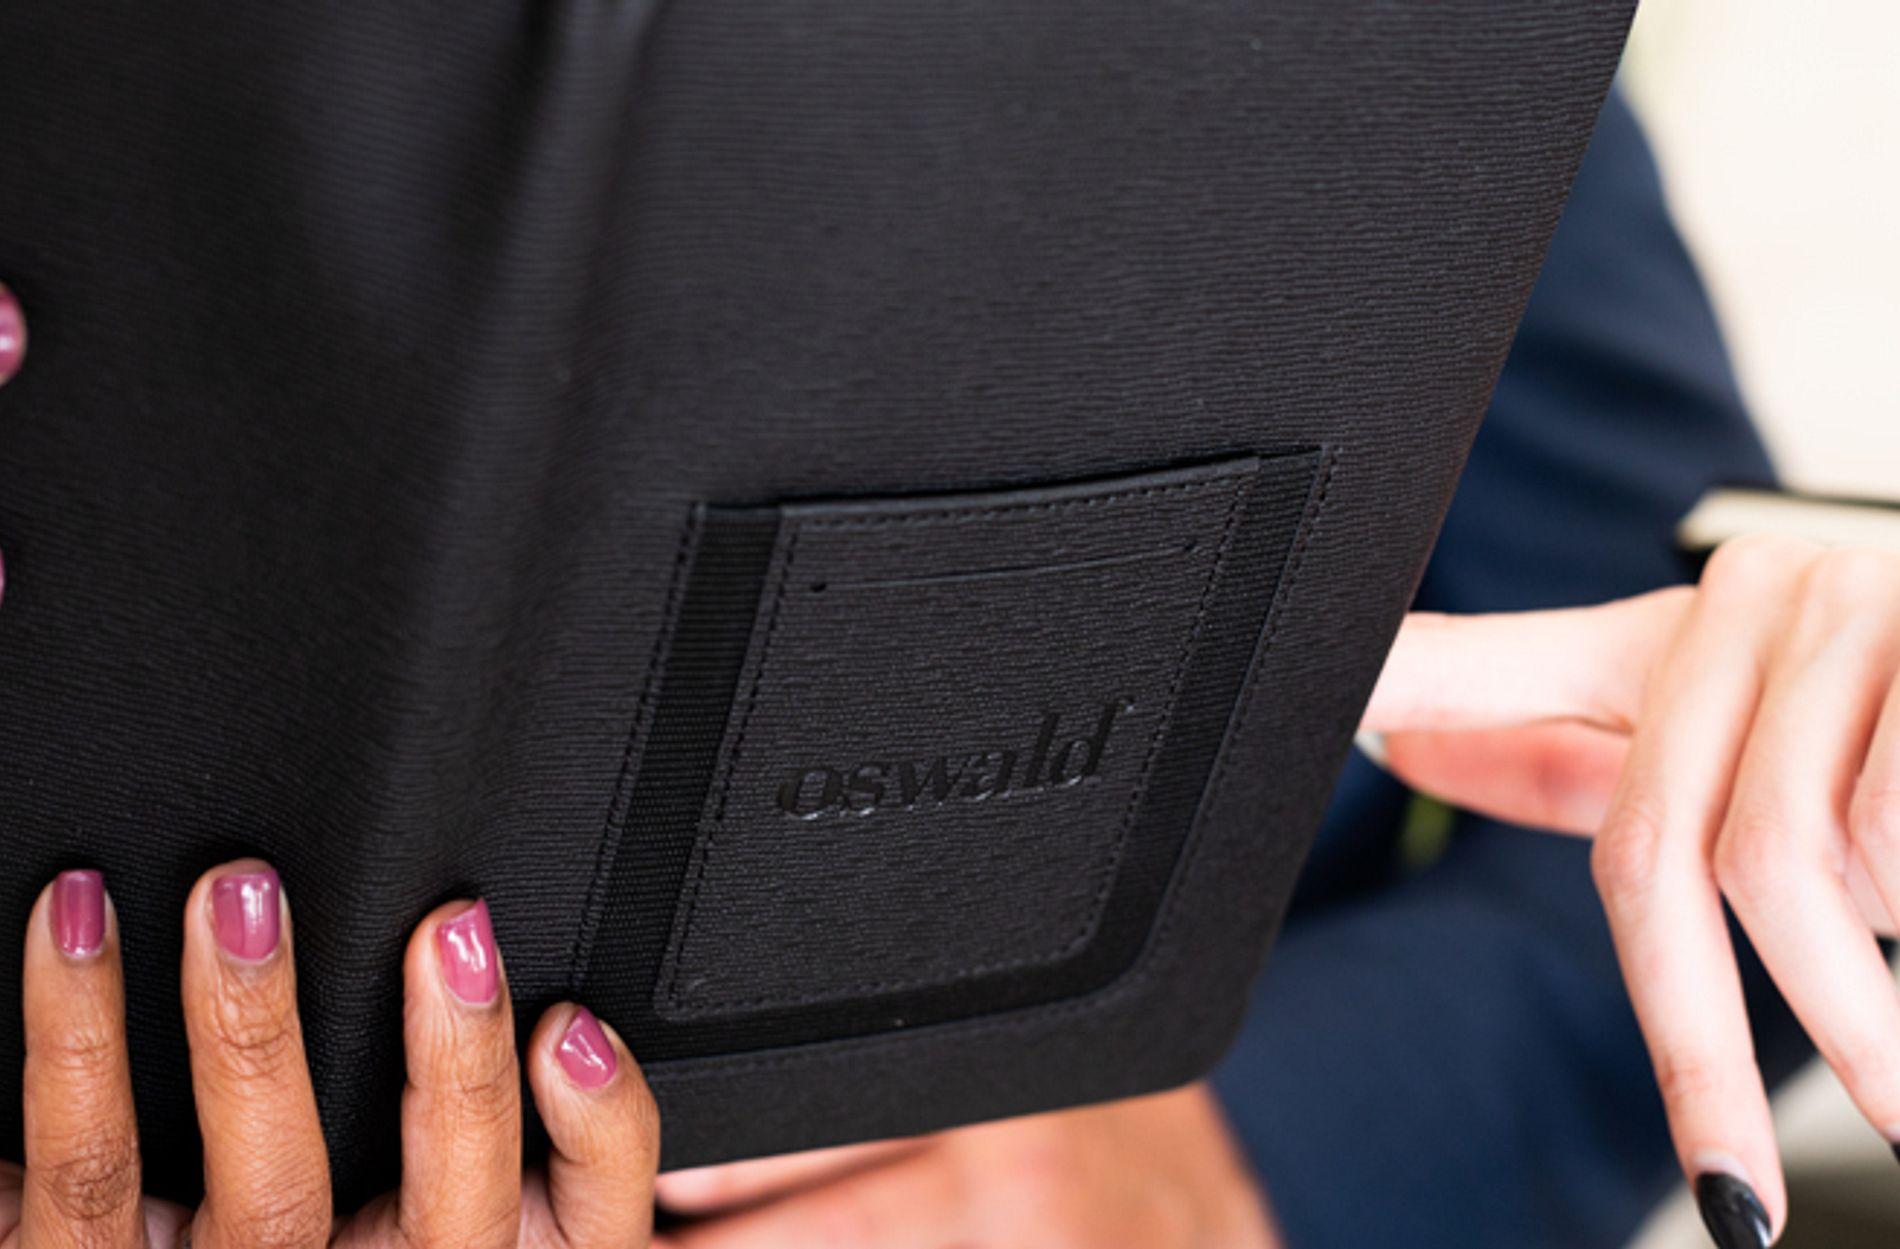 Oswald Companies Notebook